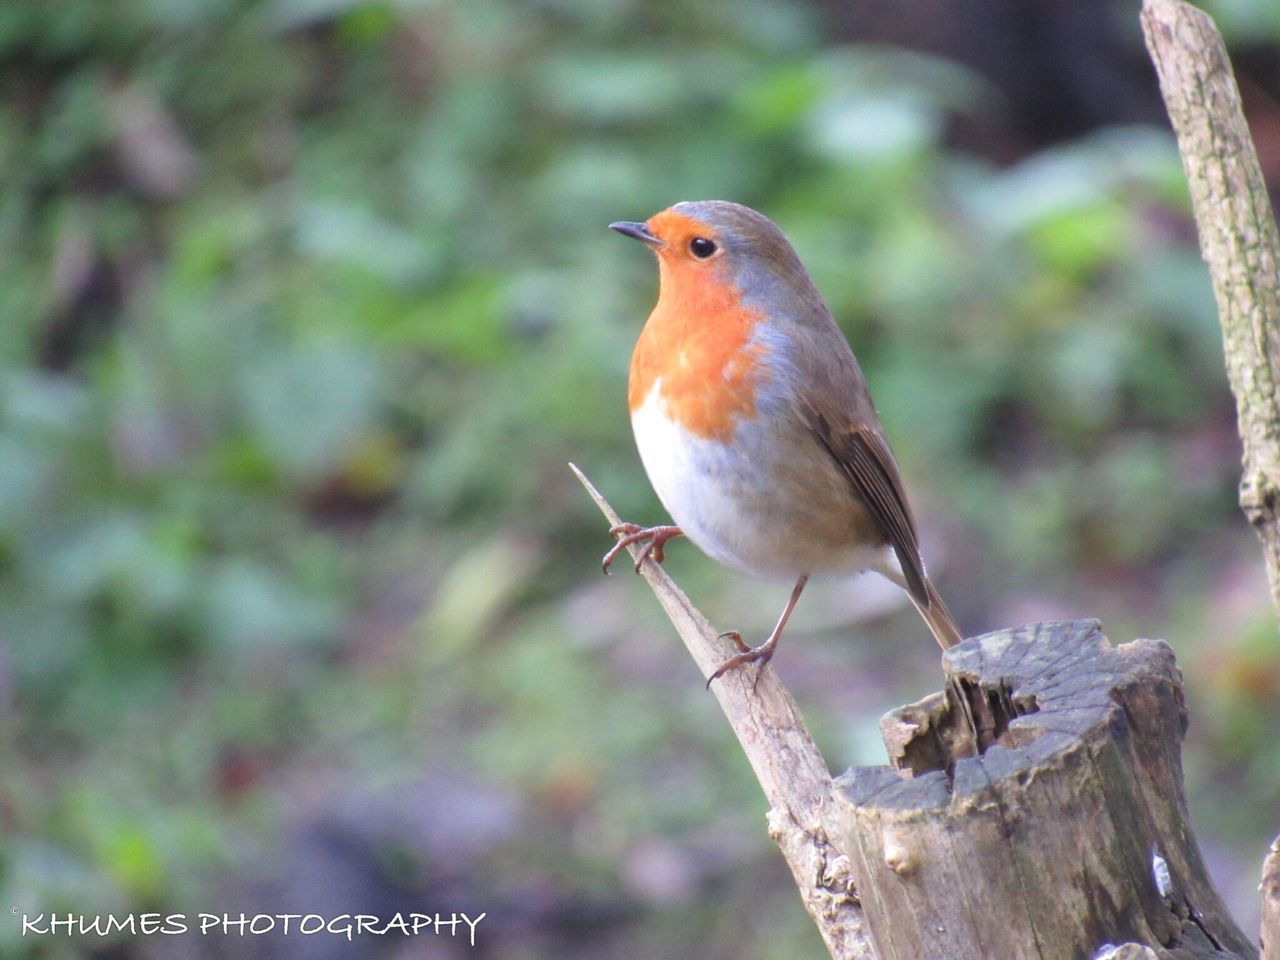 Robin Bird Animal Wildlife Perching Close-up Nature Branch Photo Photooftheday Nature Photography